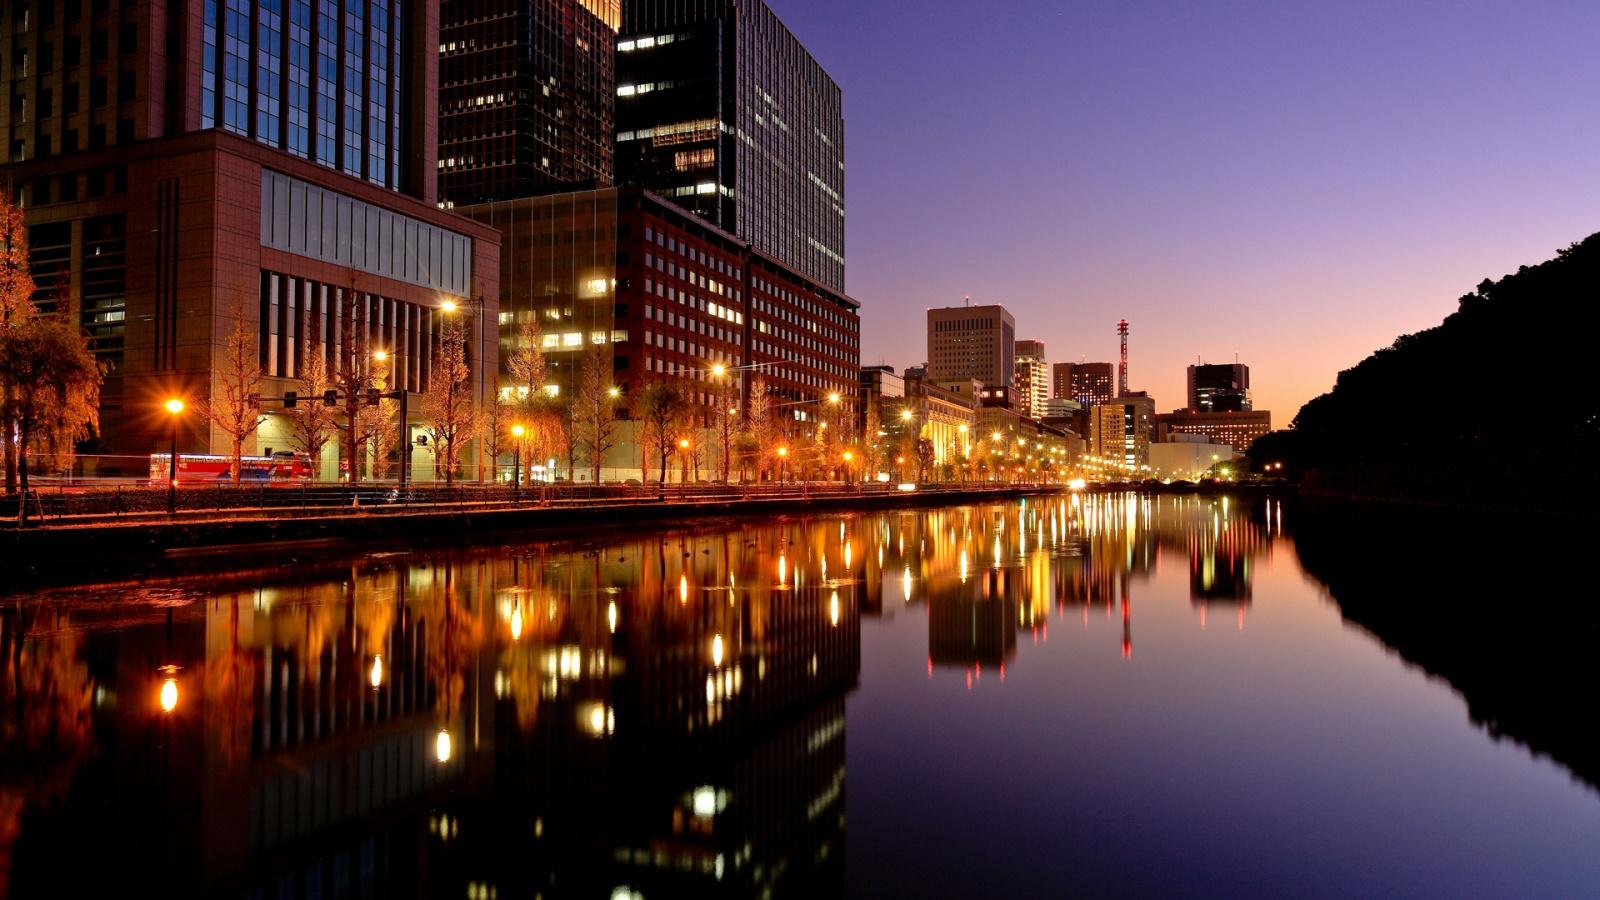 Tokyo City Night Lights Wallpapers   852x480   150708 1600x900